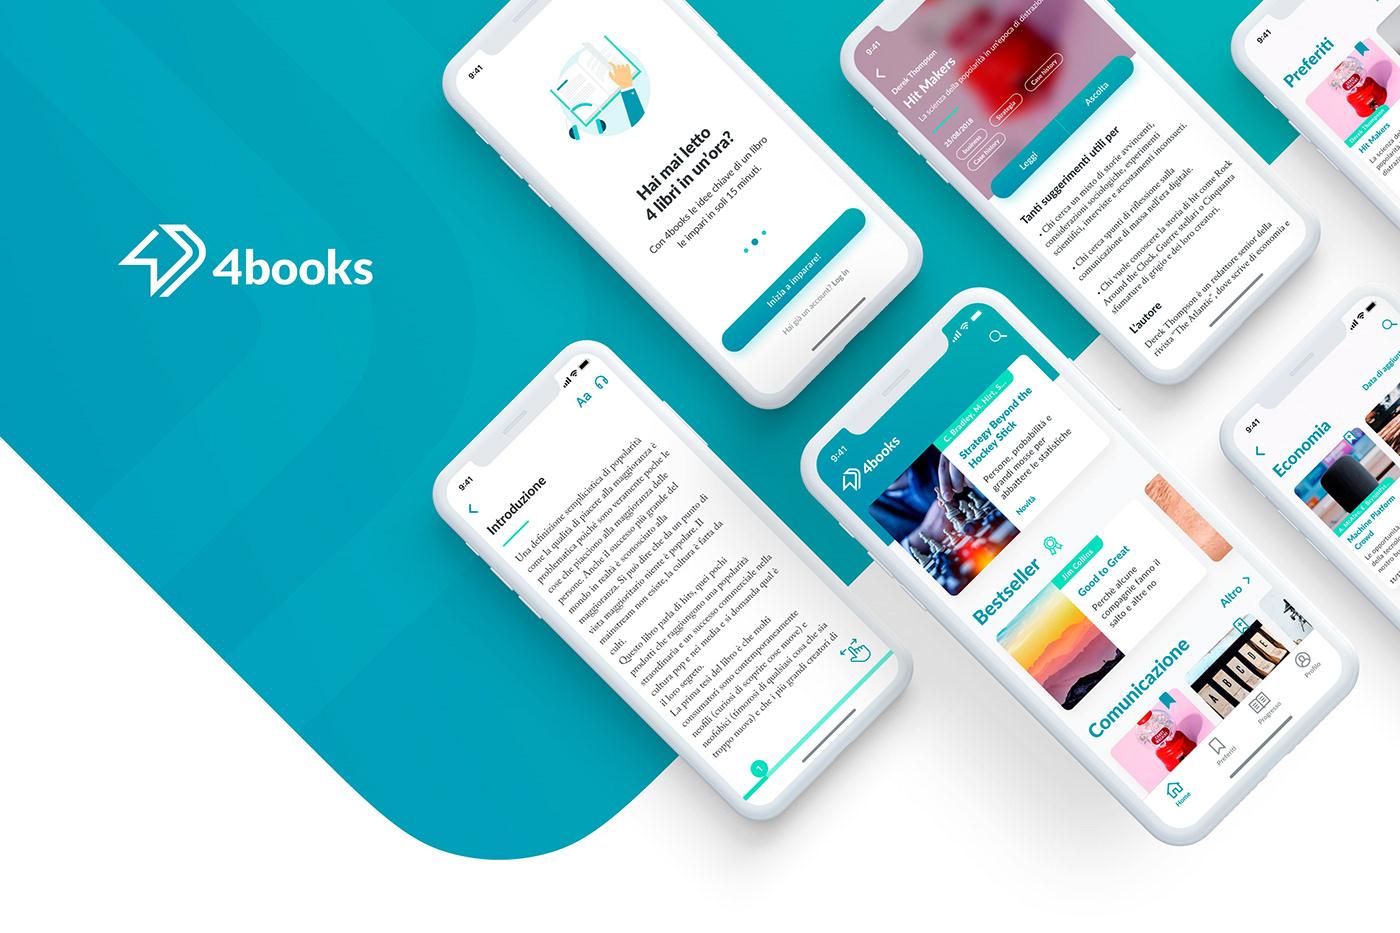 App Di Design 4books | mobile & web app on behance